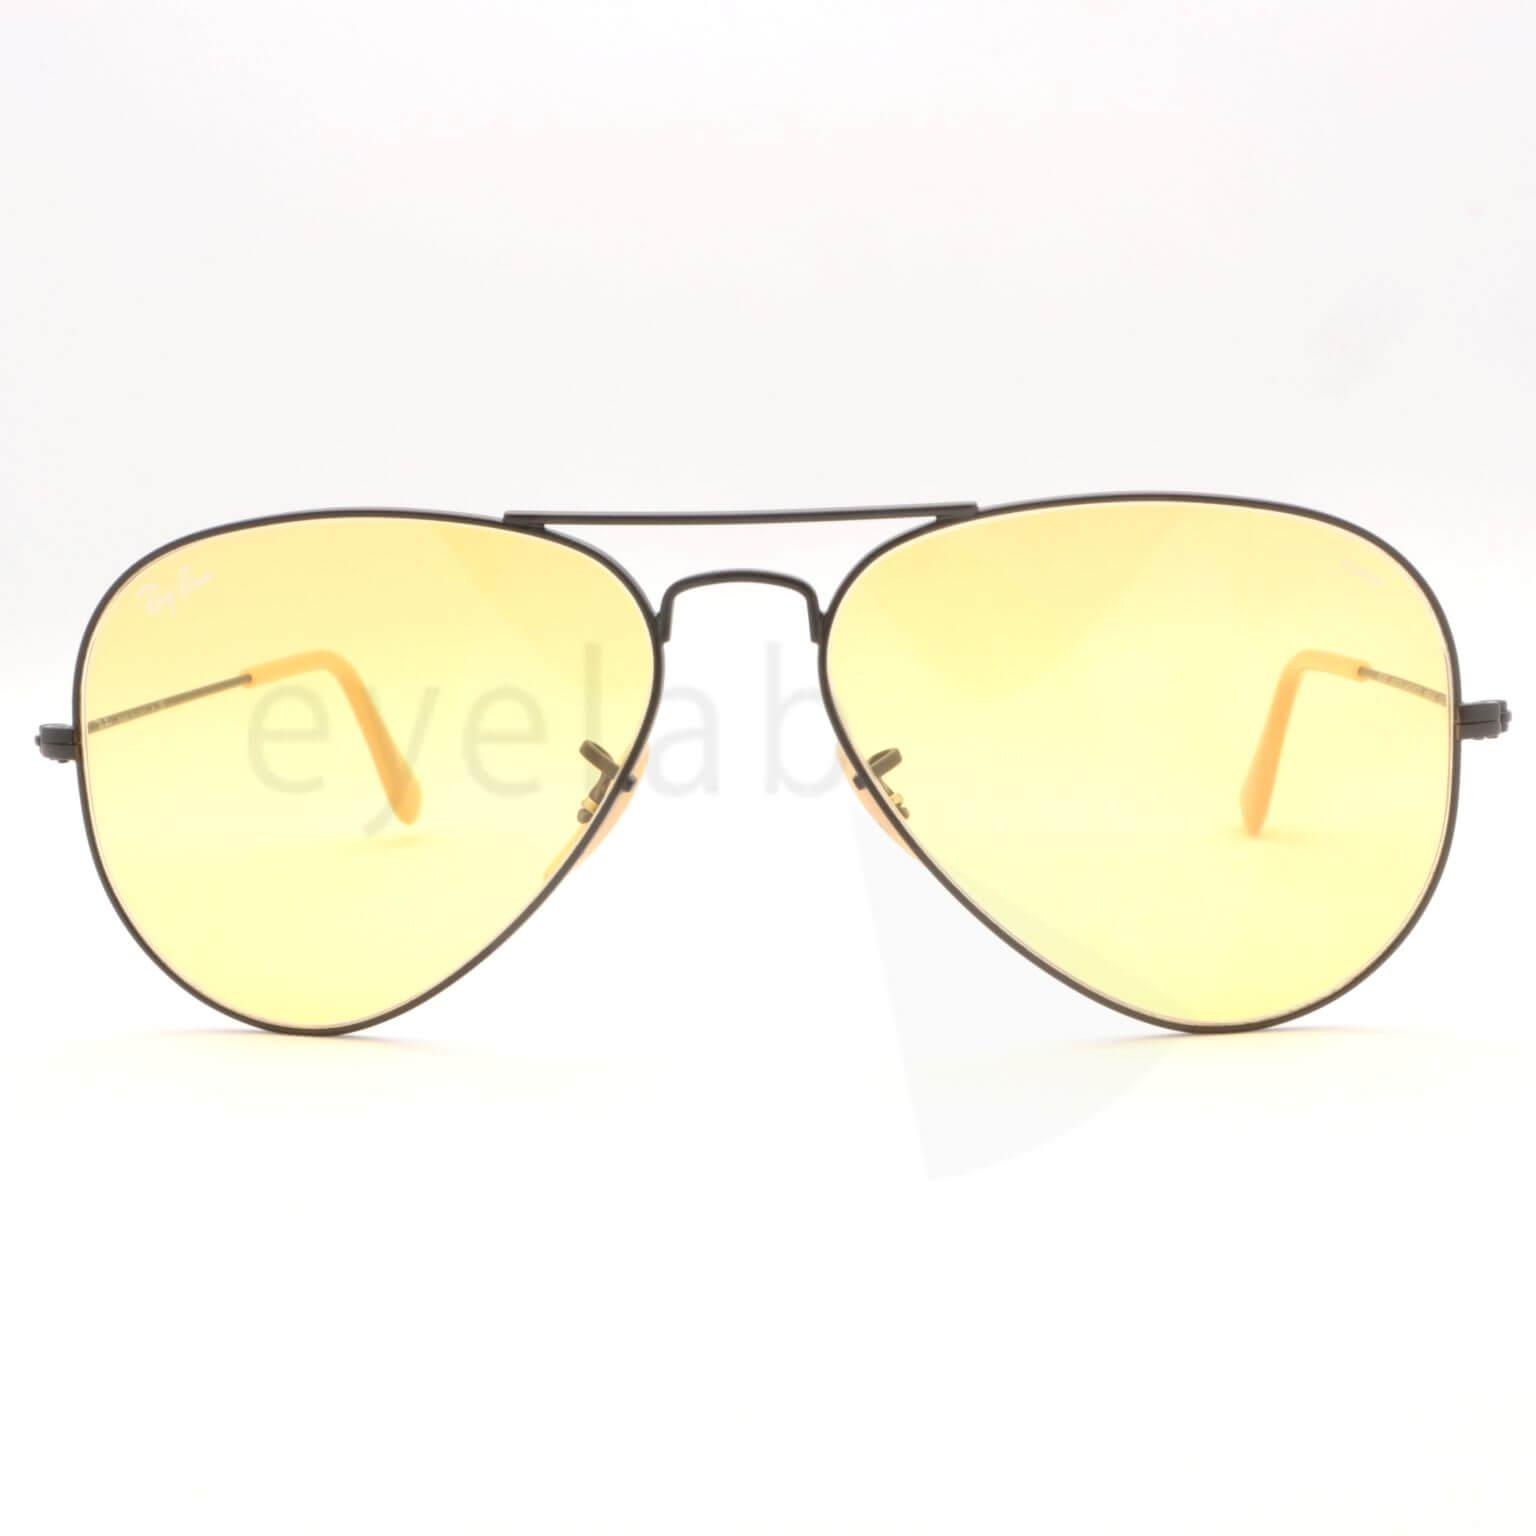 2c1b586b37 Γυαλιά ηλίου Ray-Ban 3025 90664A 58 Aviator Evolve ~ Οπτικά Eyelab